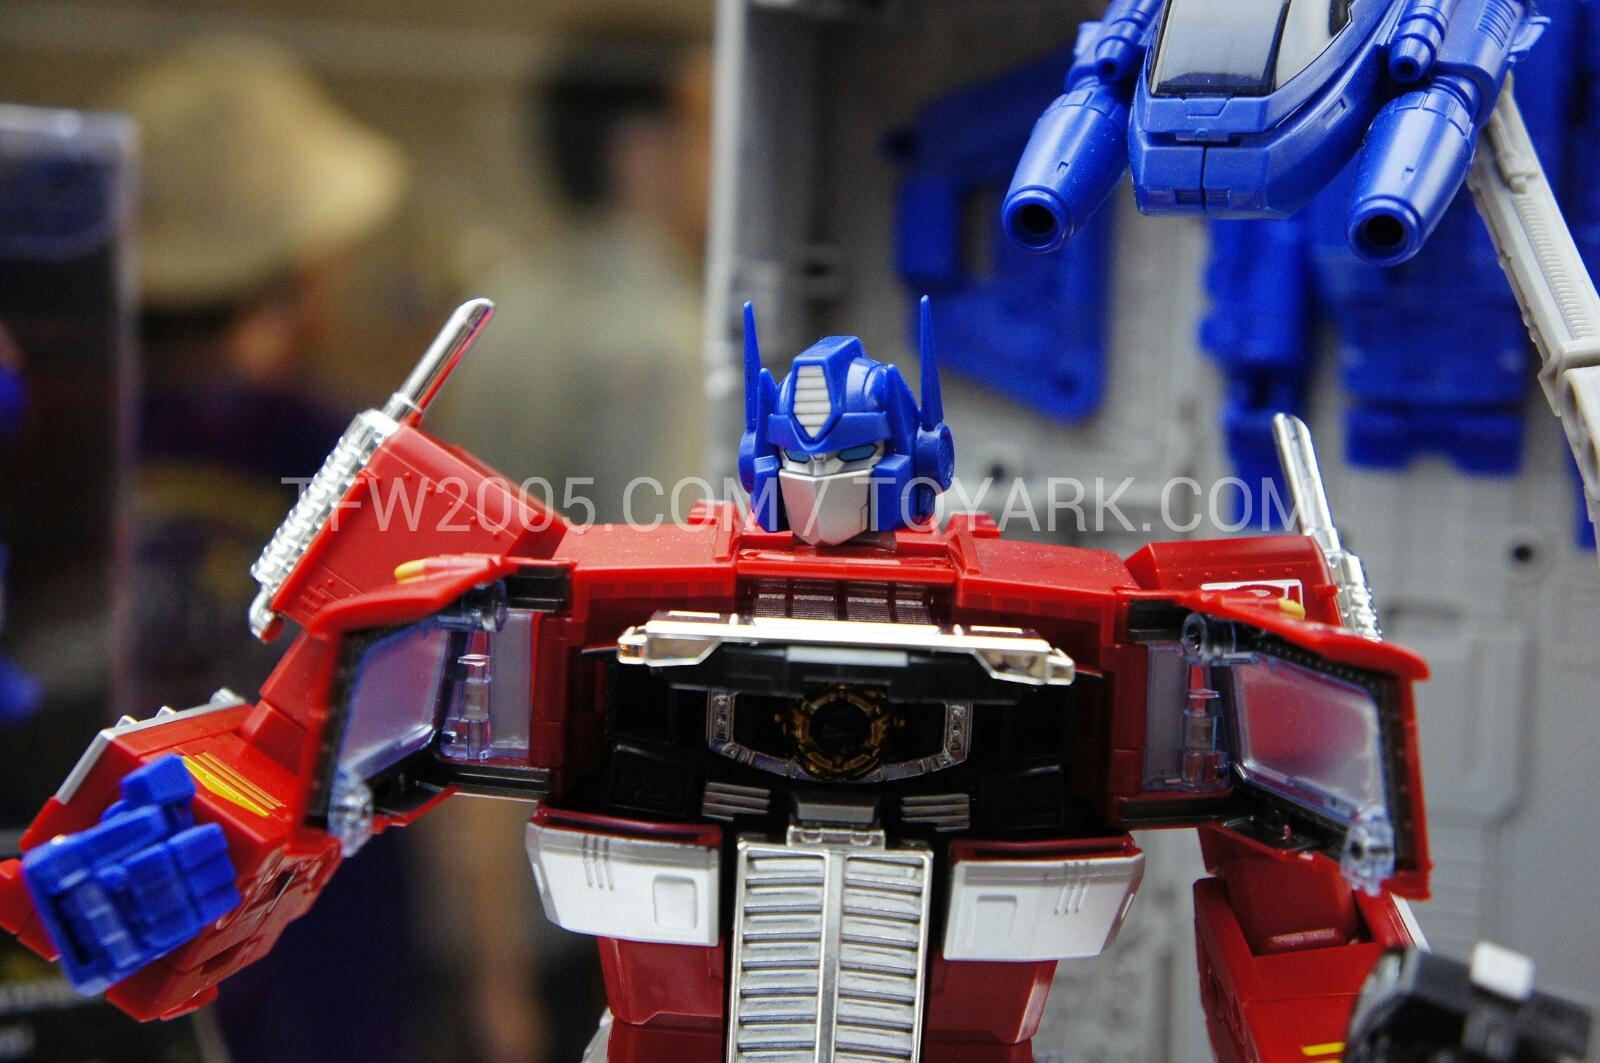 [Masterpiece] MP-10 Optimus Prime/Optimus Primus - TakaraTomy | Hasbro - Page 3 _DSC3069_1343116176